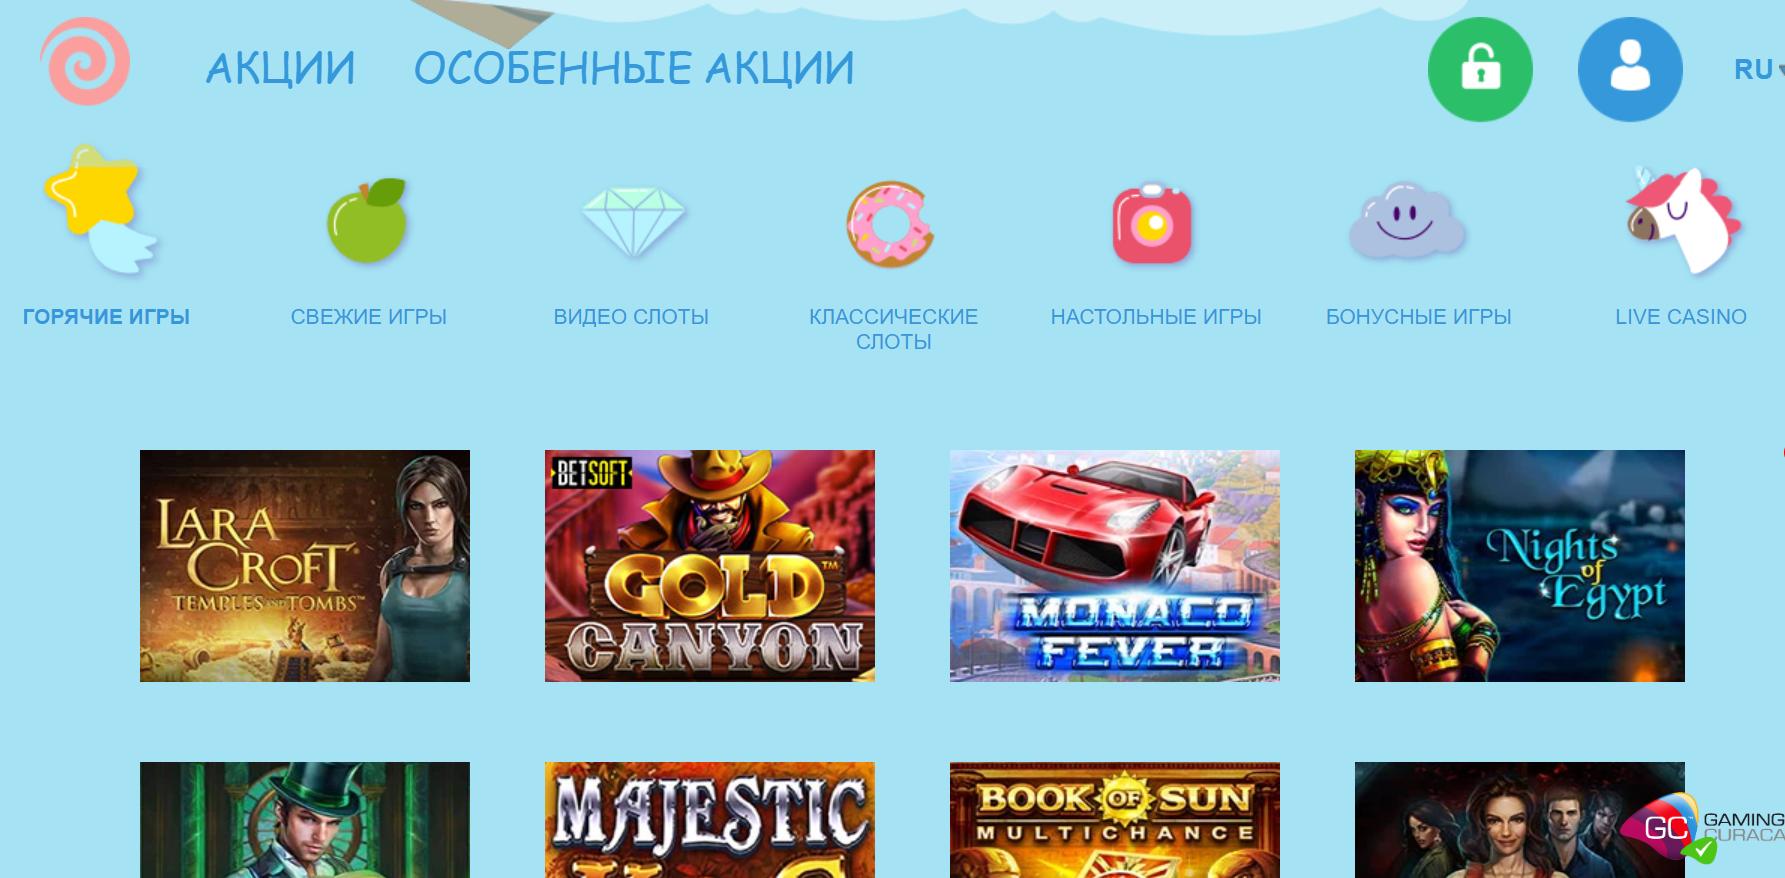 Visit Обзор казино Reeltastic